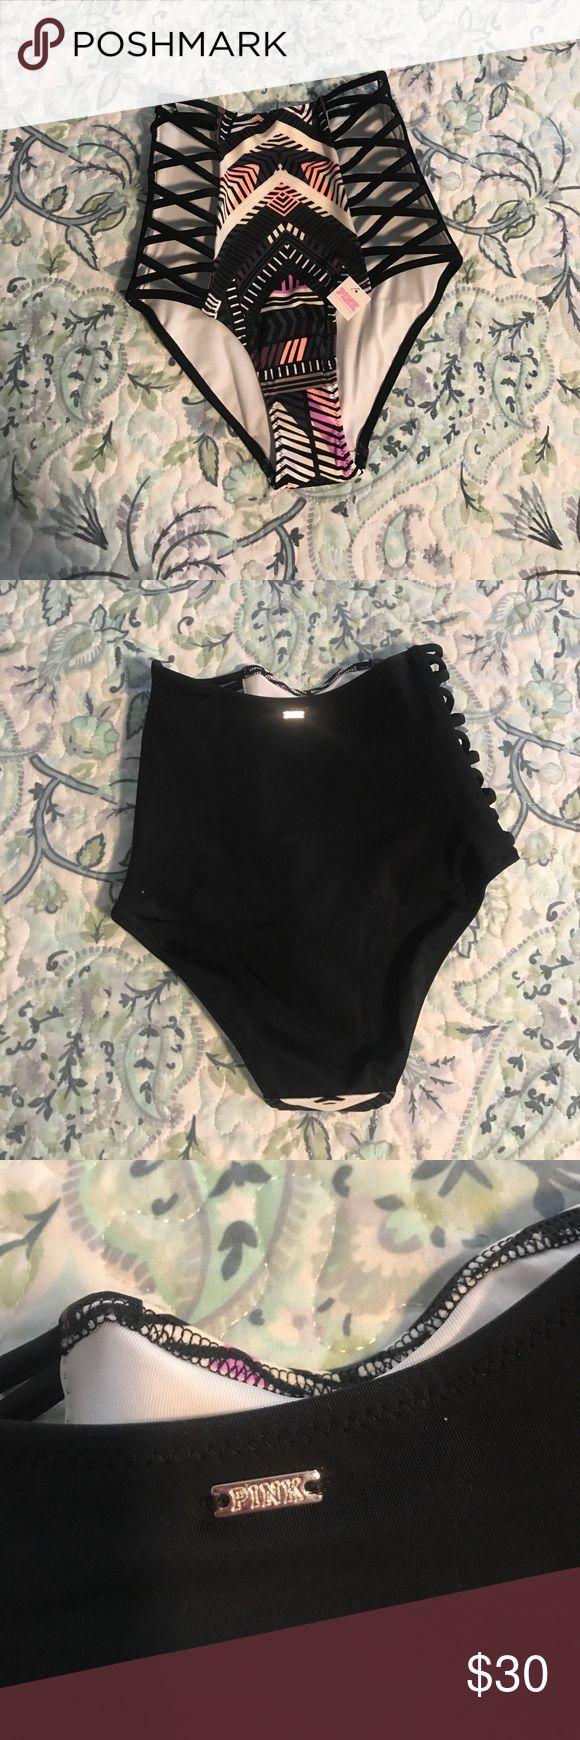 NWT PINK high waist bikini bottom NWT PINK high waist bikini bottom, size xs PINK Victoria's Secret Swim Bikinis